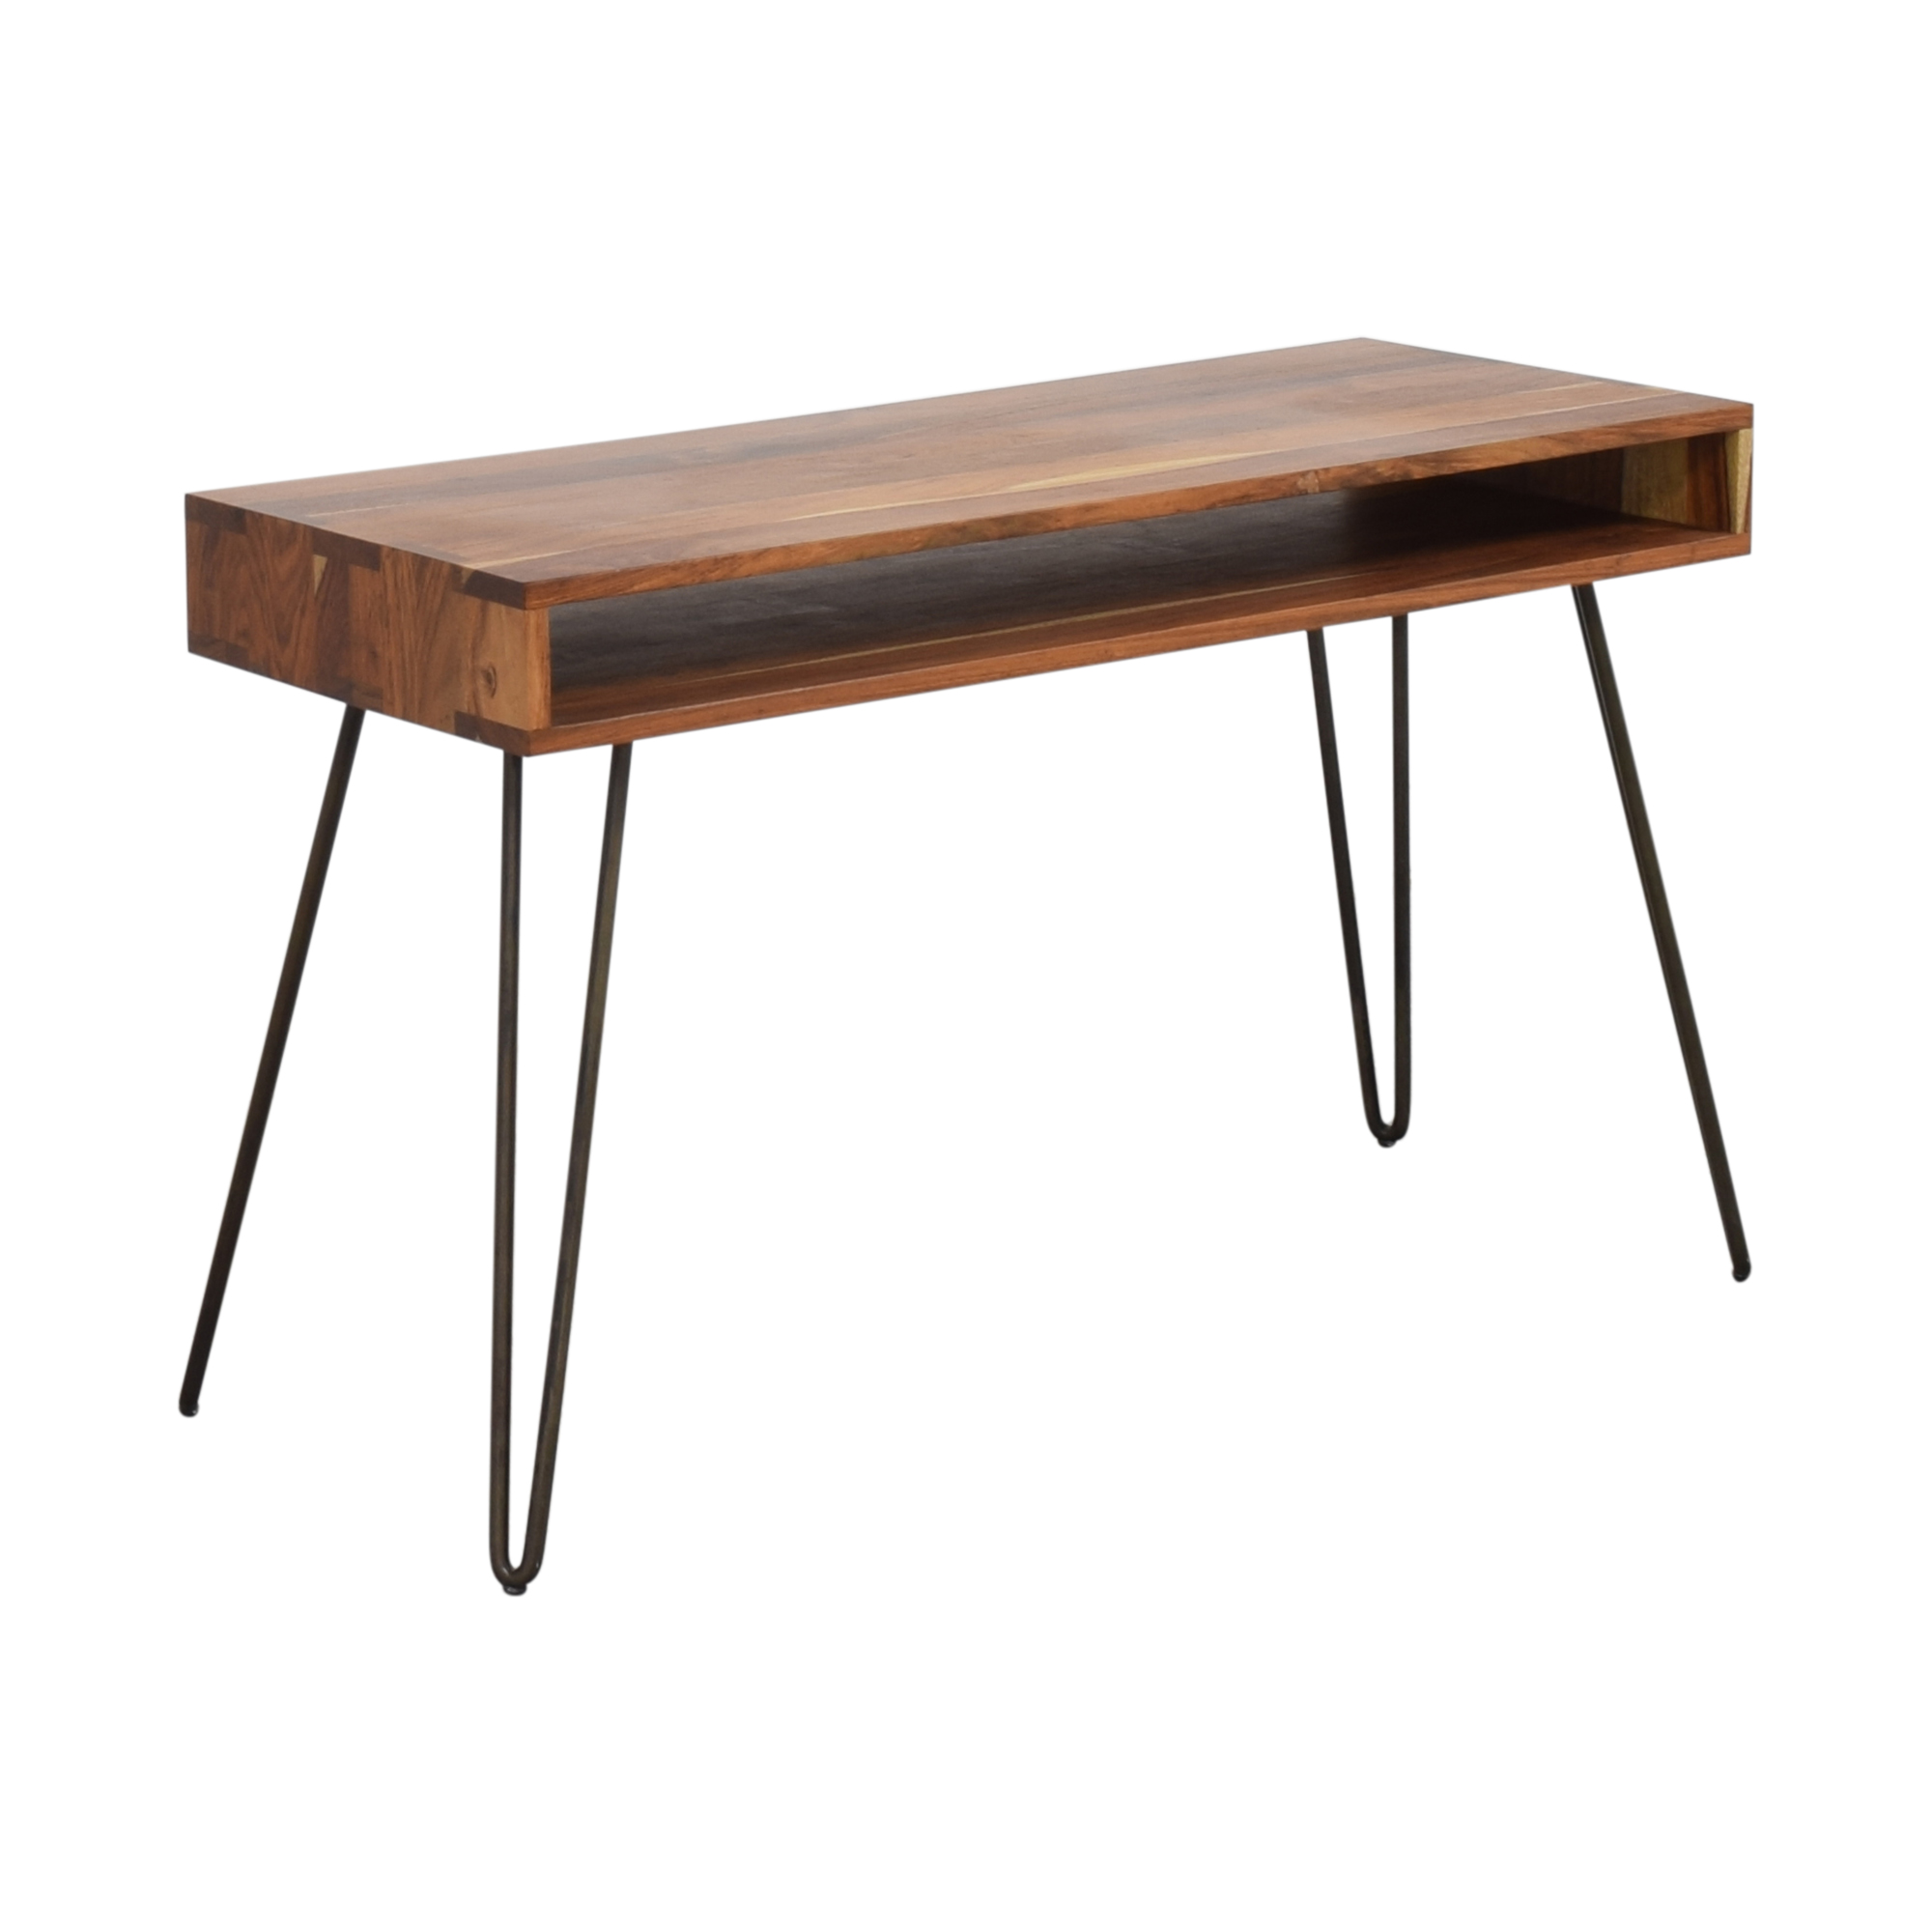 Brooklyn City Furniture Brooklyn City Furniture Ciao Desk for sale